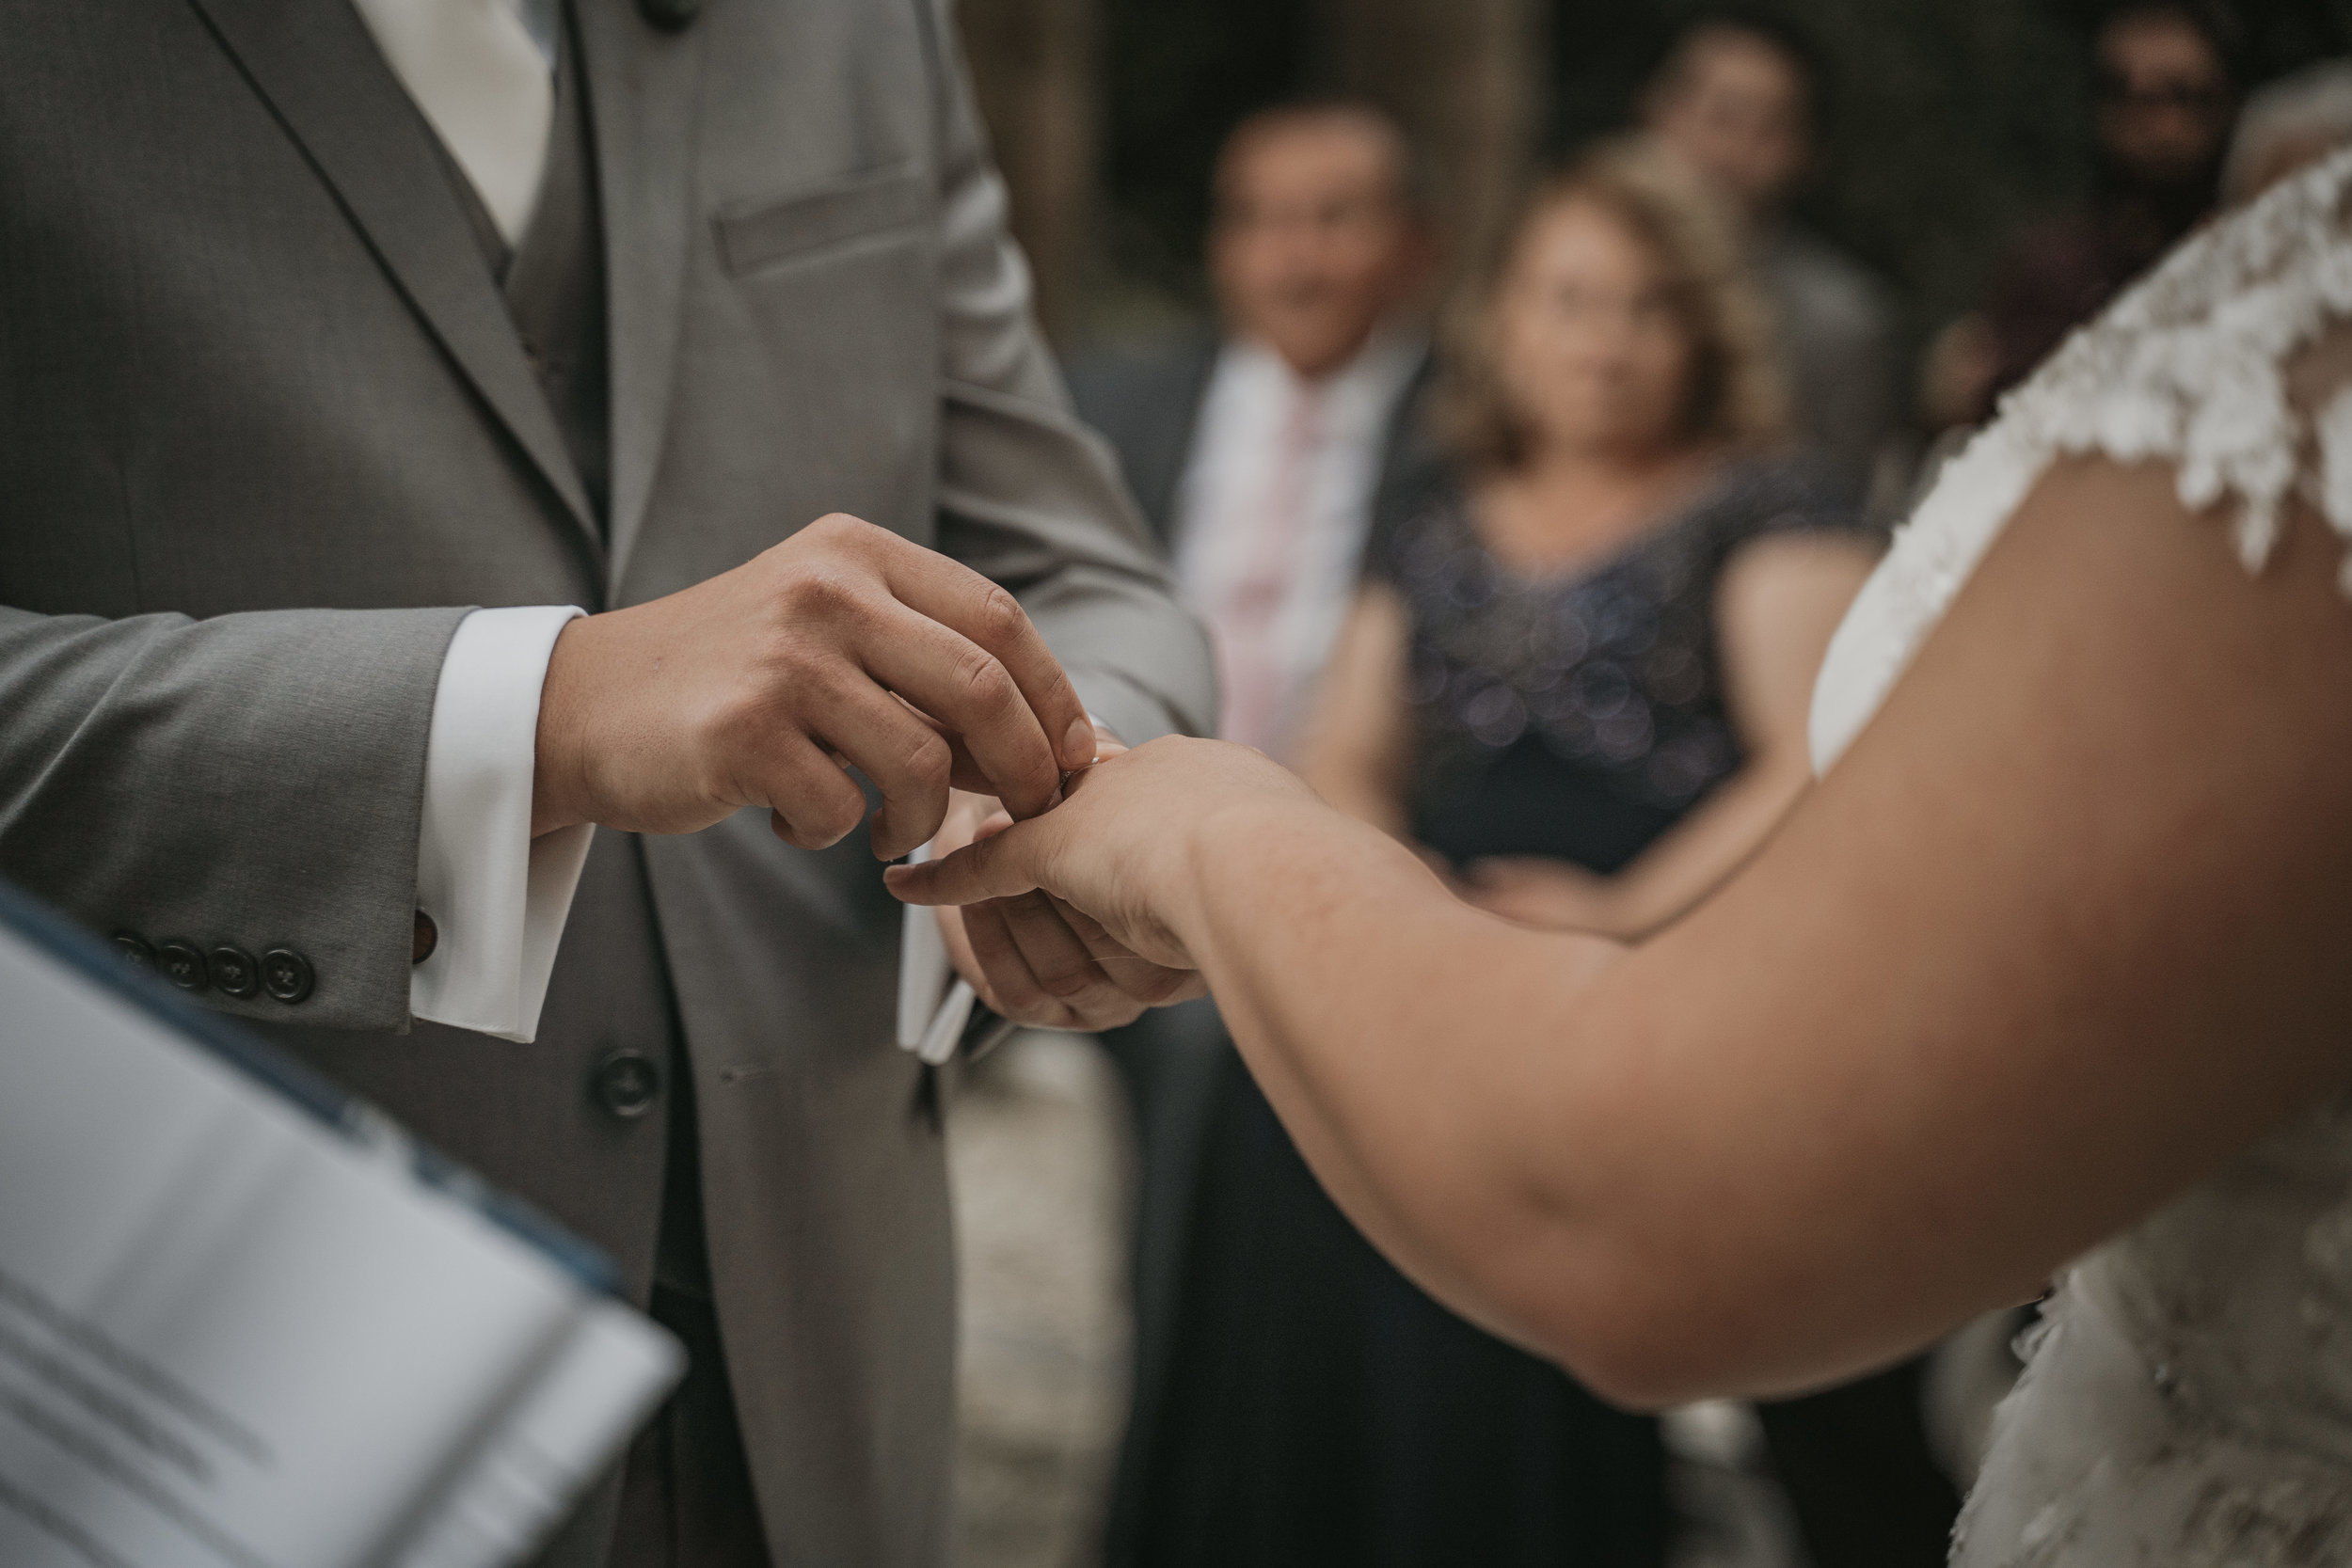 287MICHI&GABEWEDDINGDAY(WeddingFinal).jpg